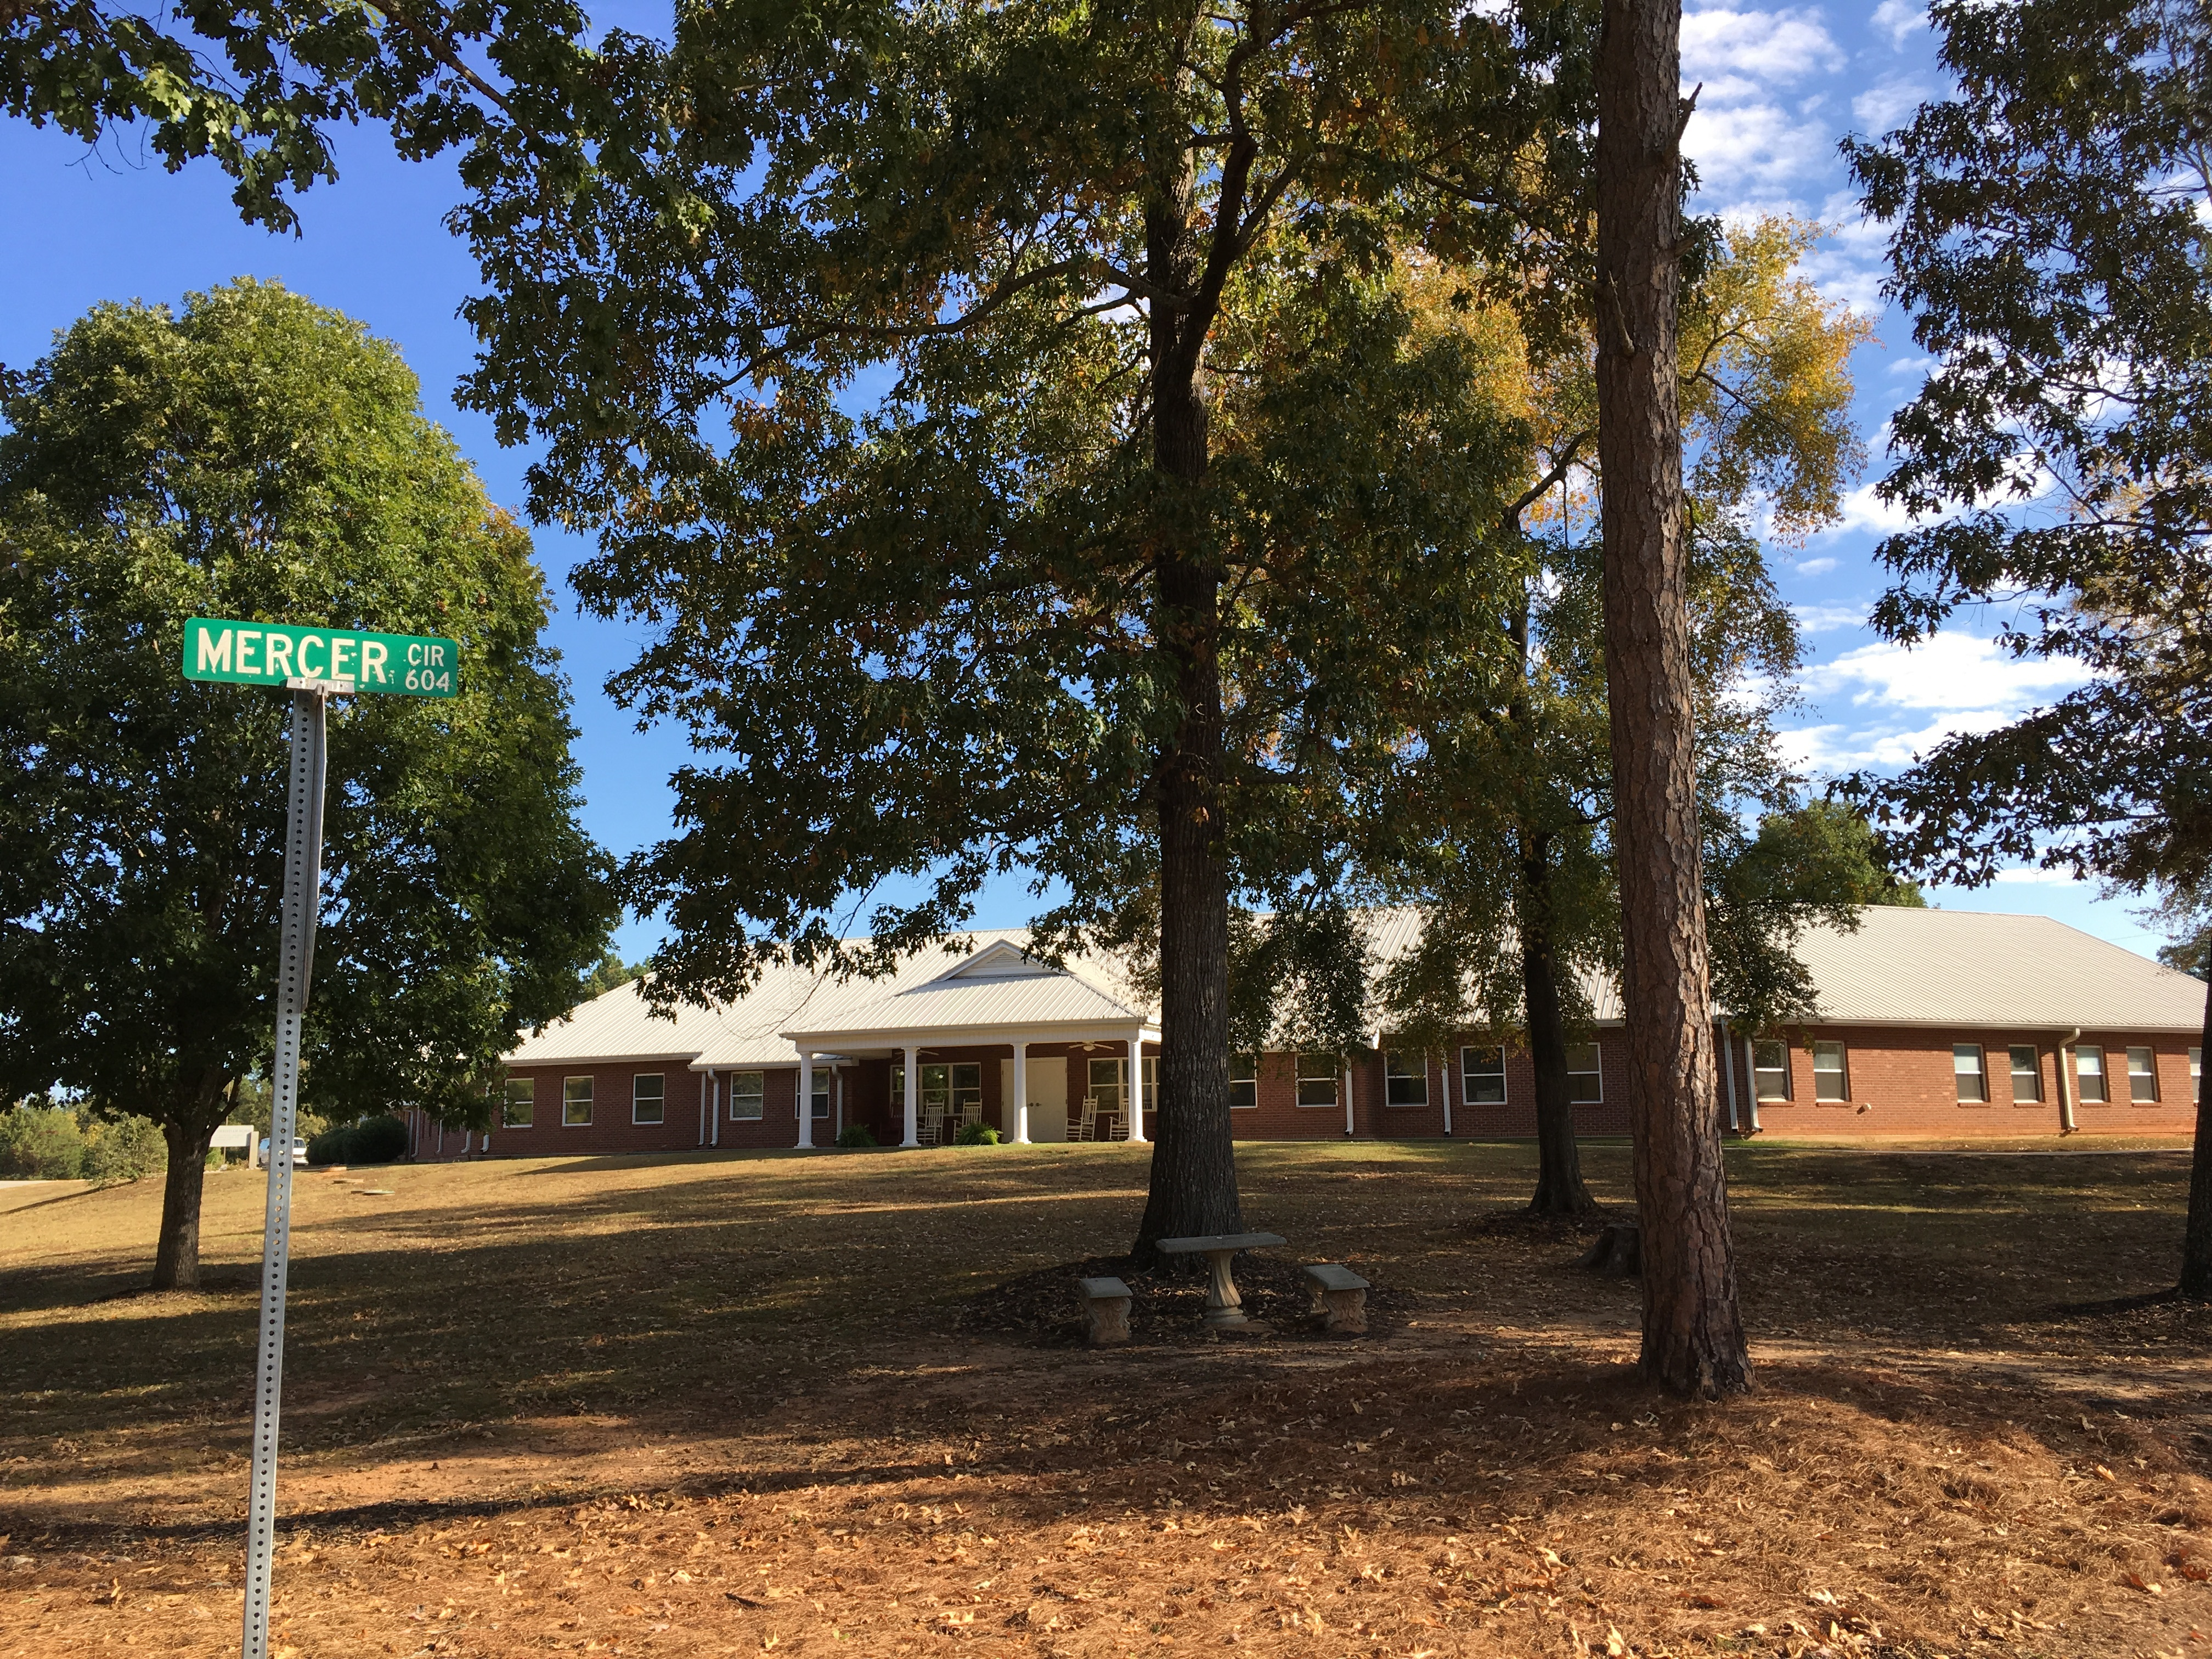 PCH Mercer Road Sign